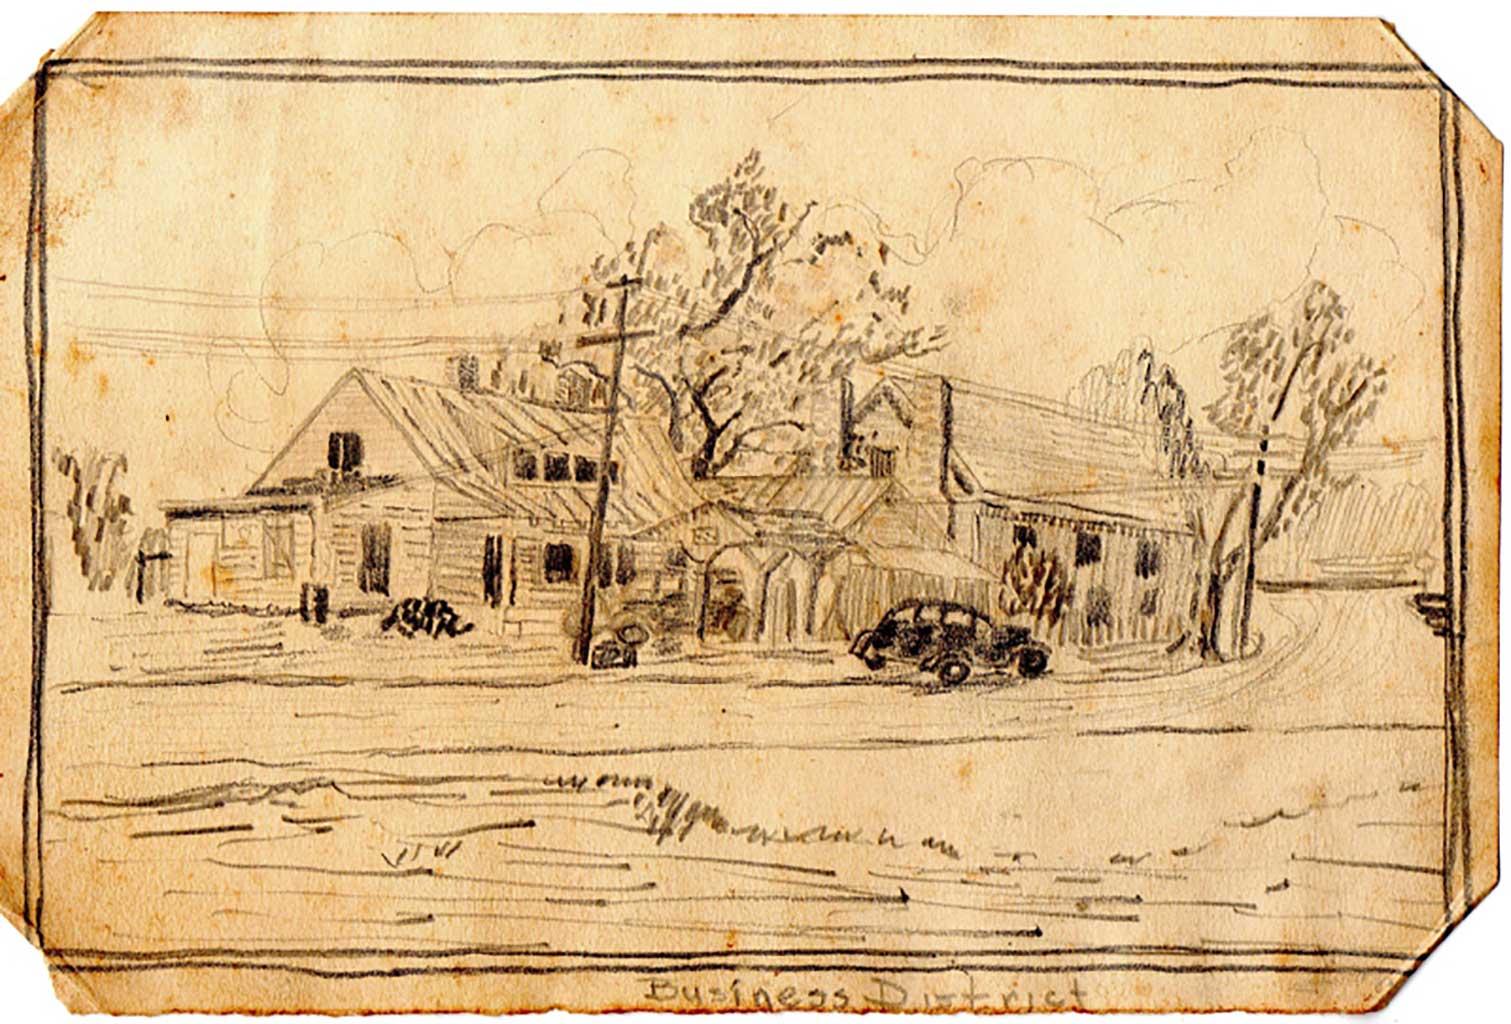 pensil-sketch-of-moores-store-and-gwaltneys-store-img413